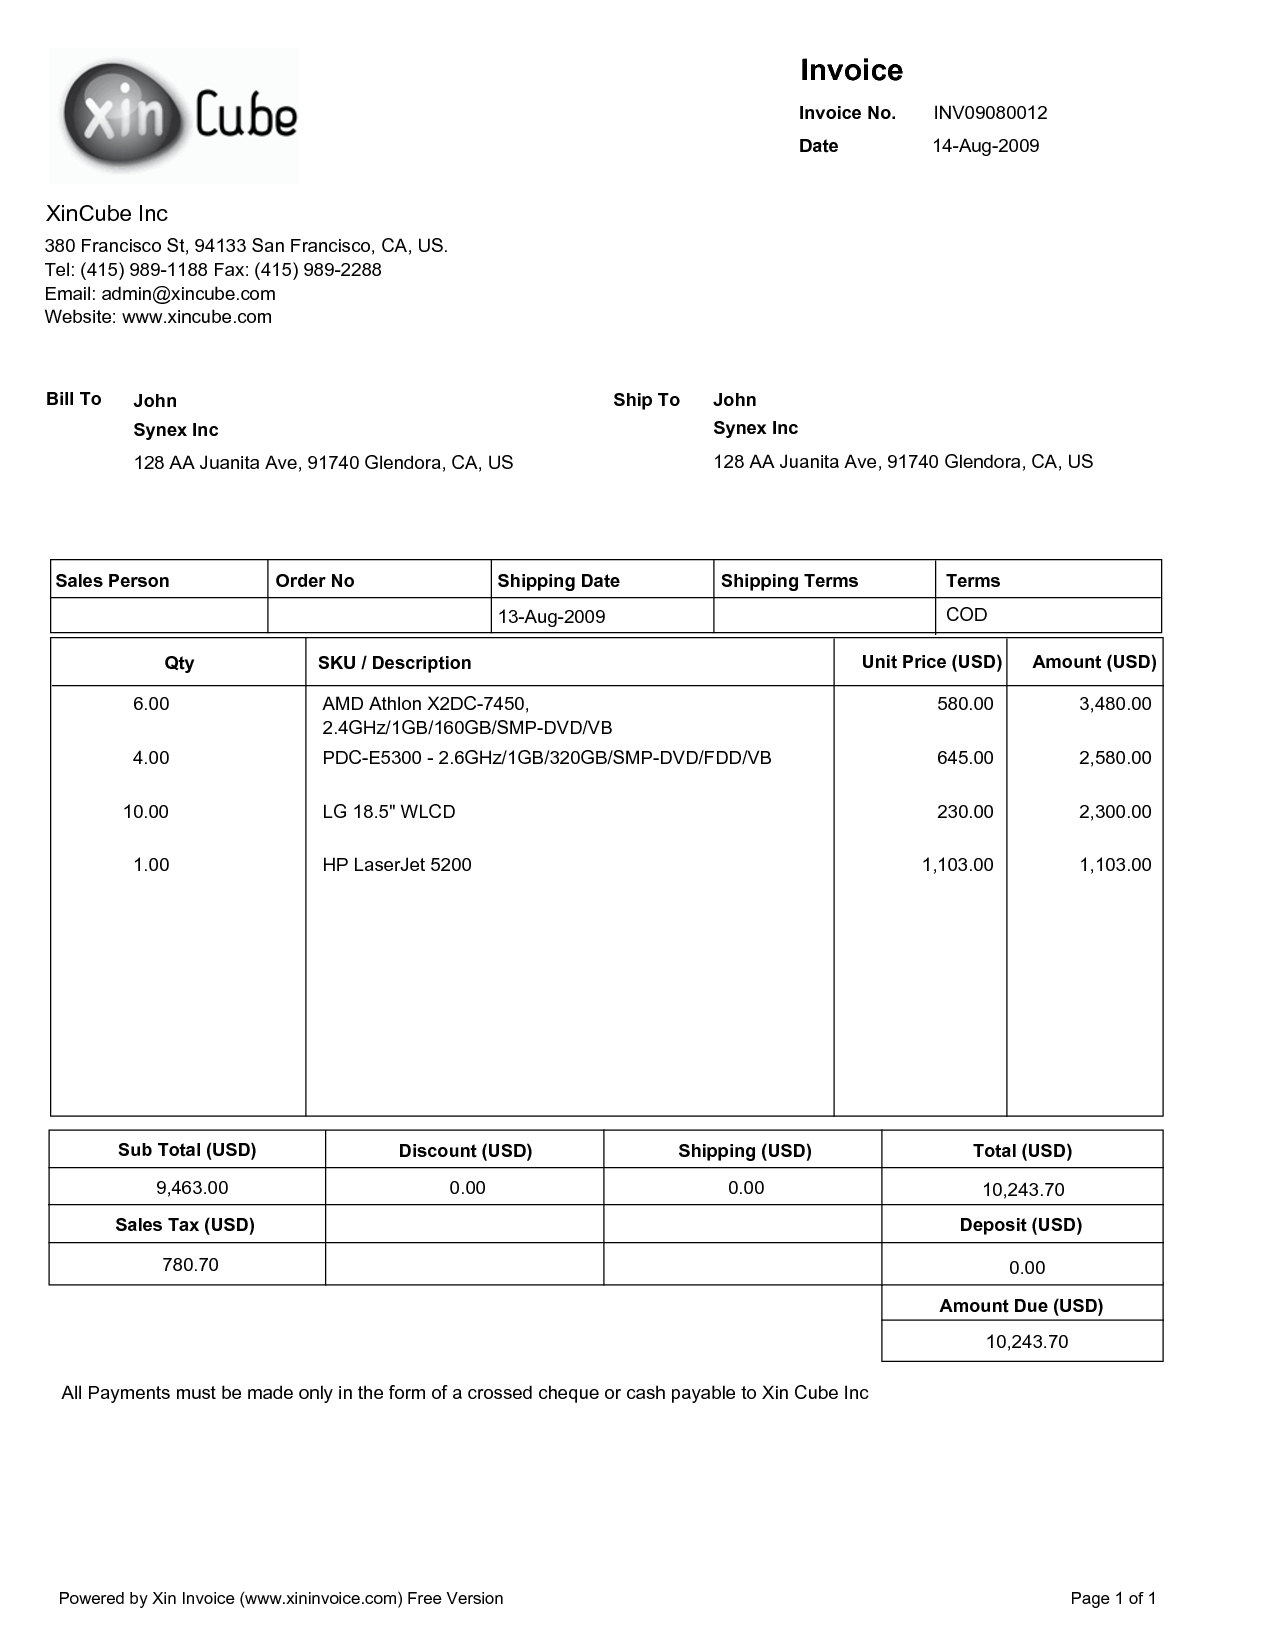 invoice template pdf invoice template pdf vnzgames 1275 X 1650